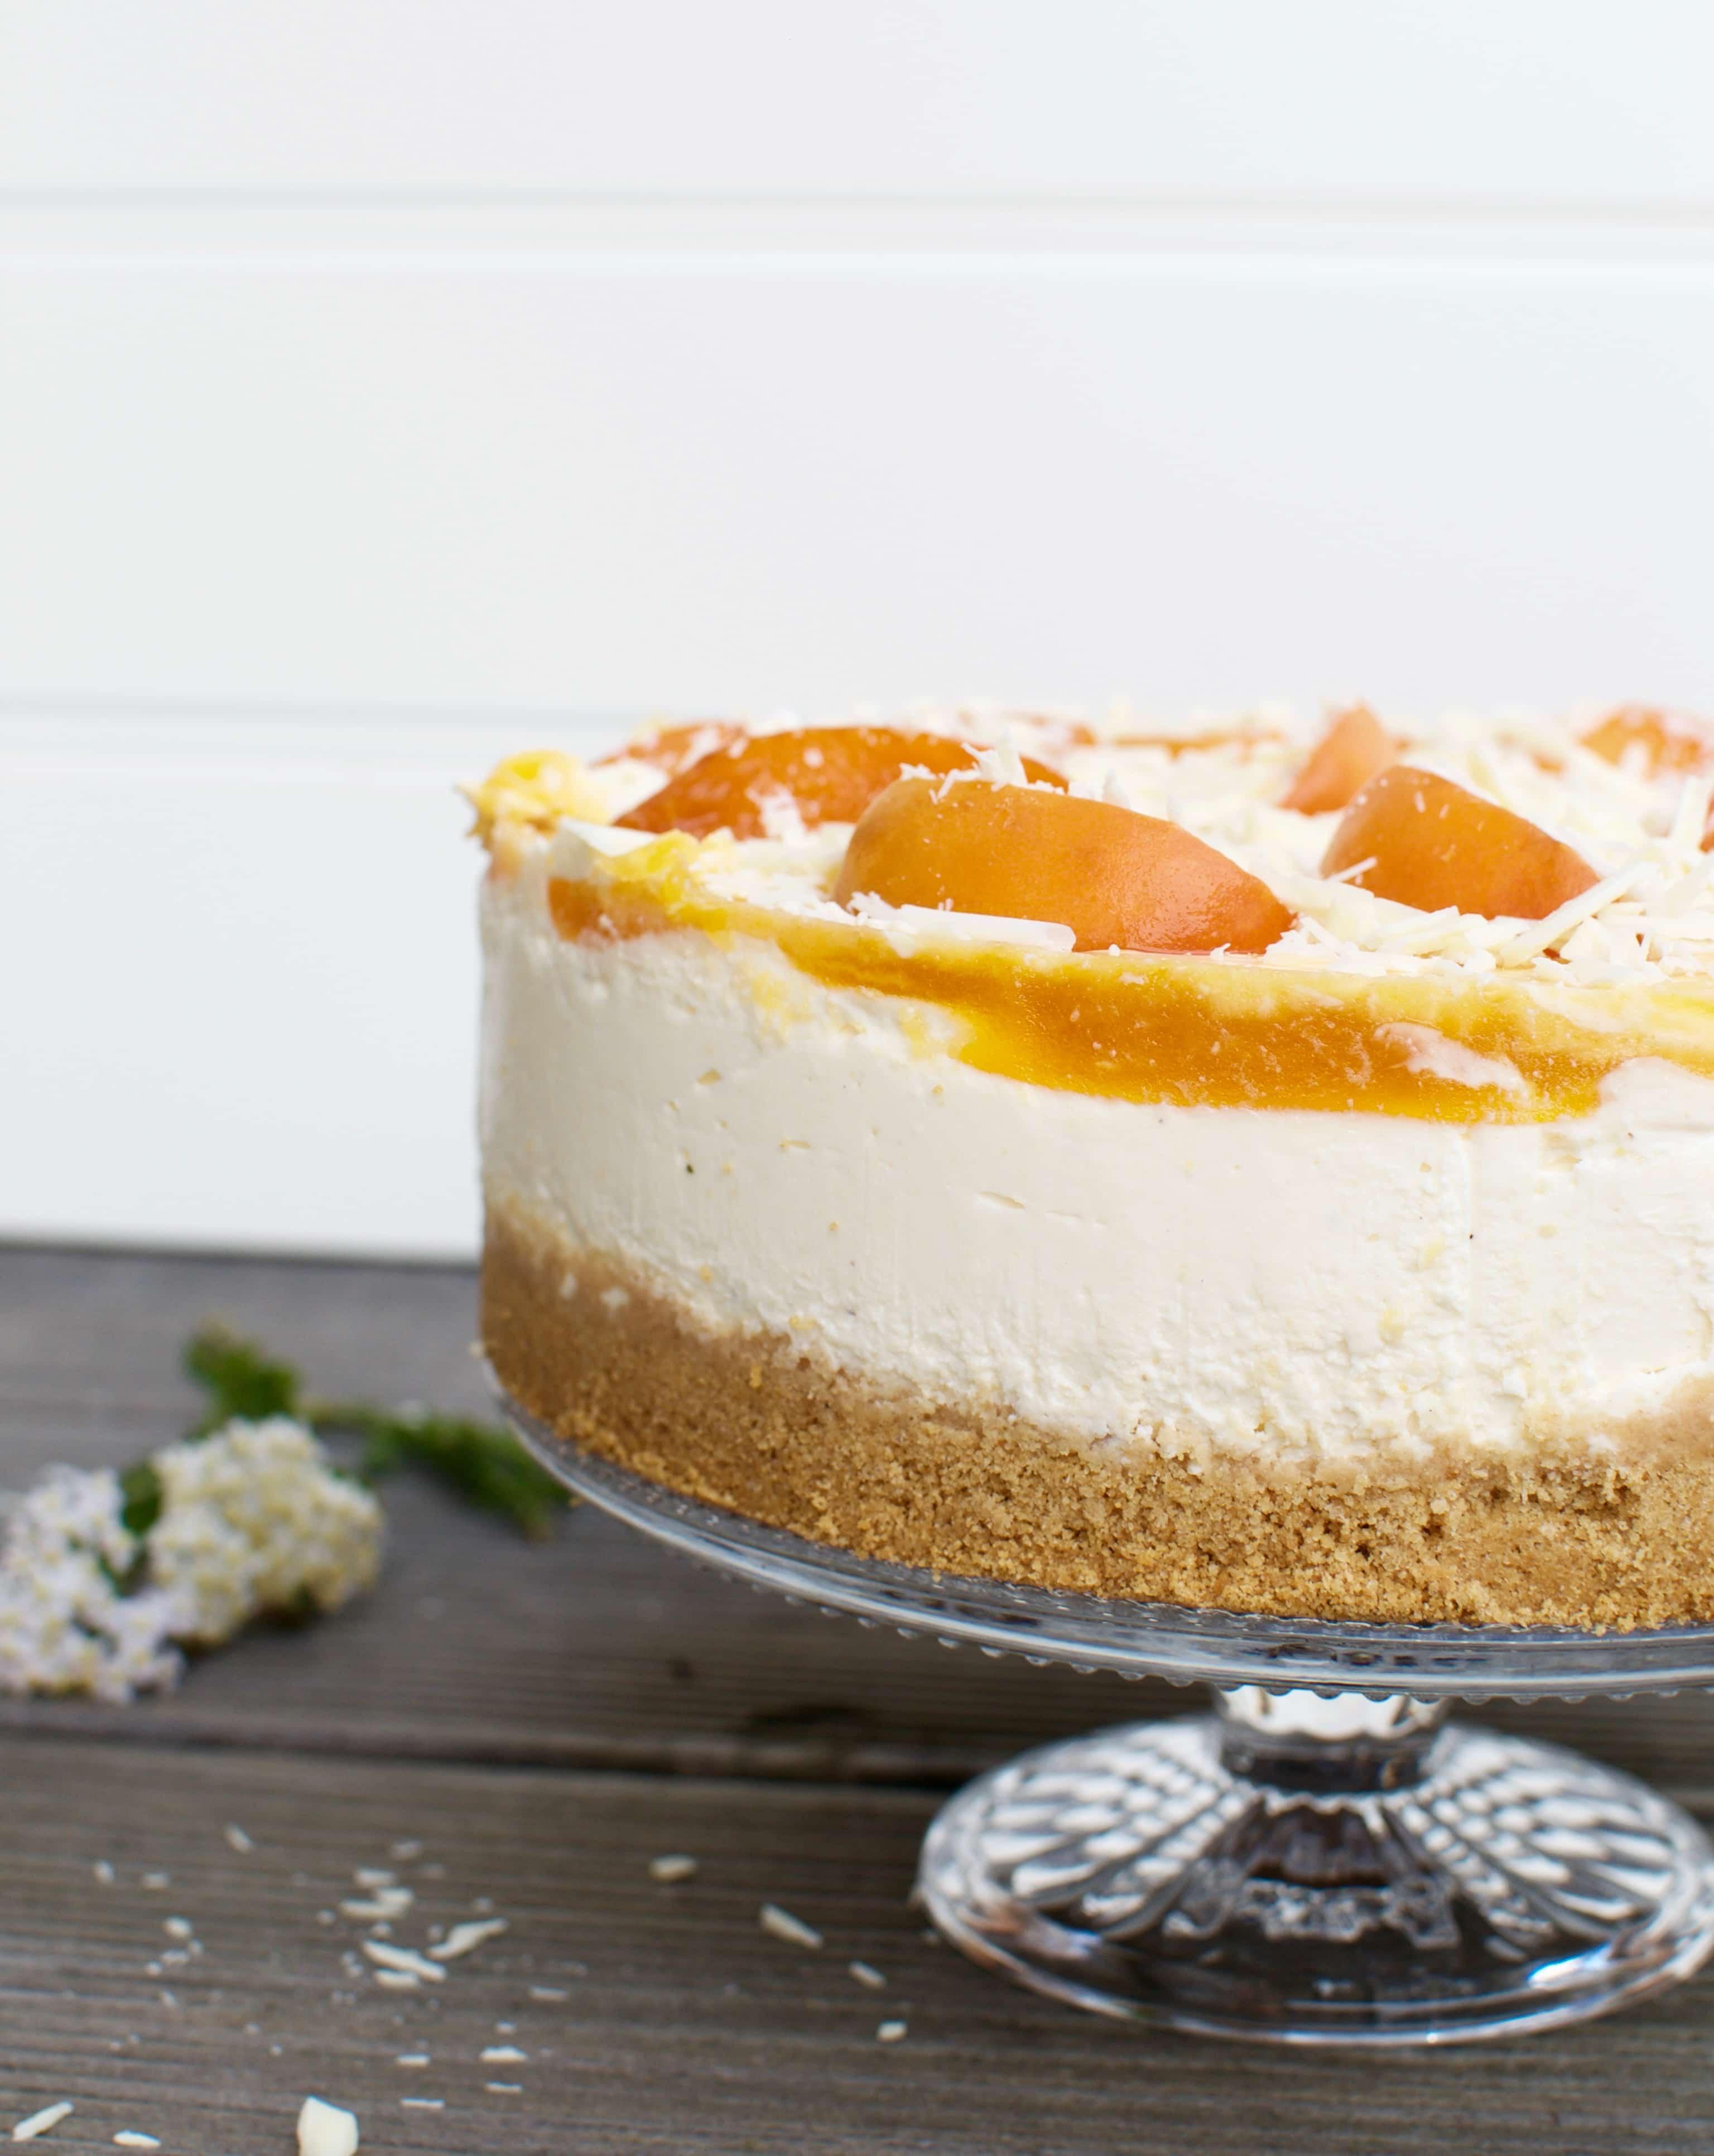 No Bake Marillen Cheesecake